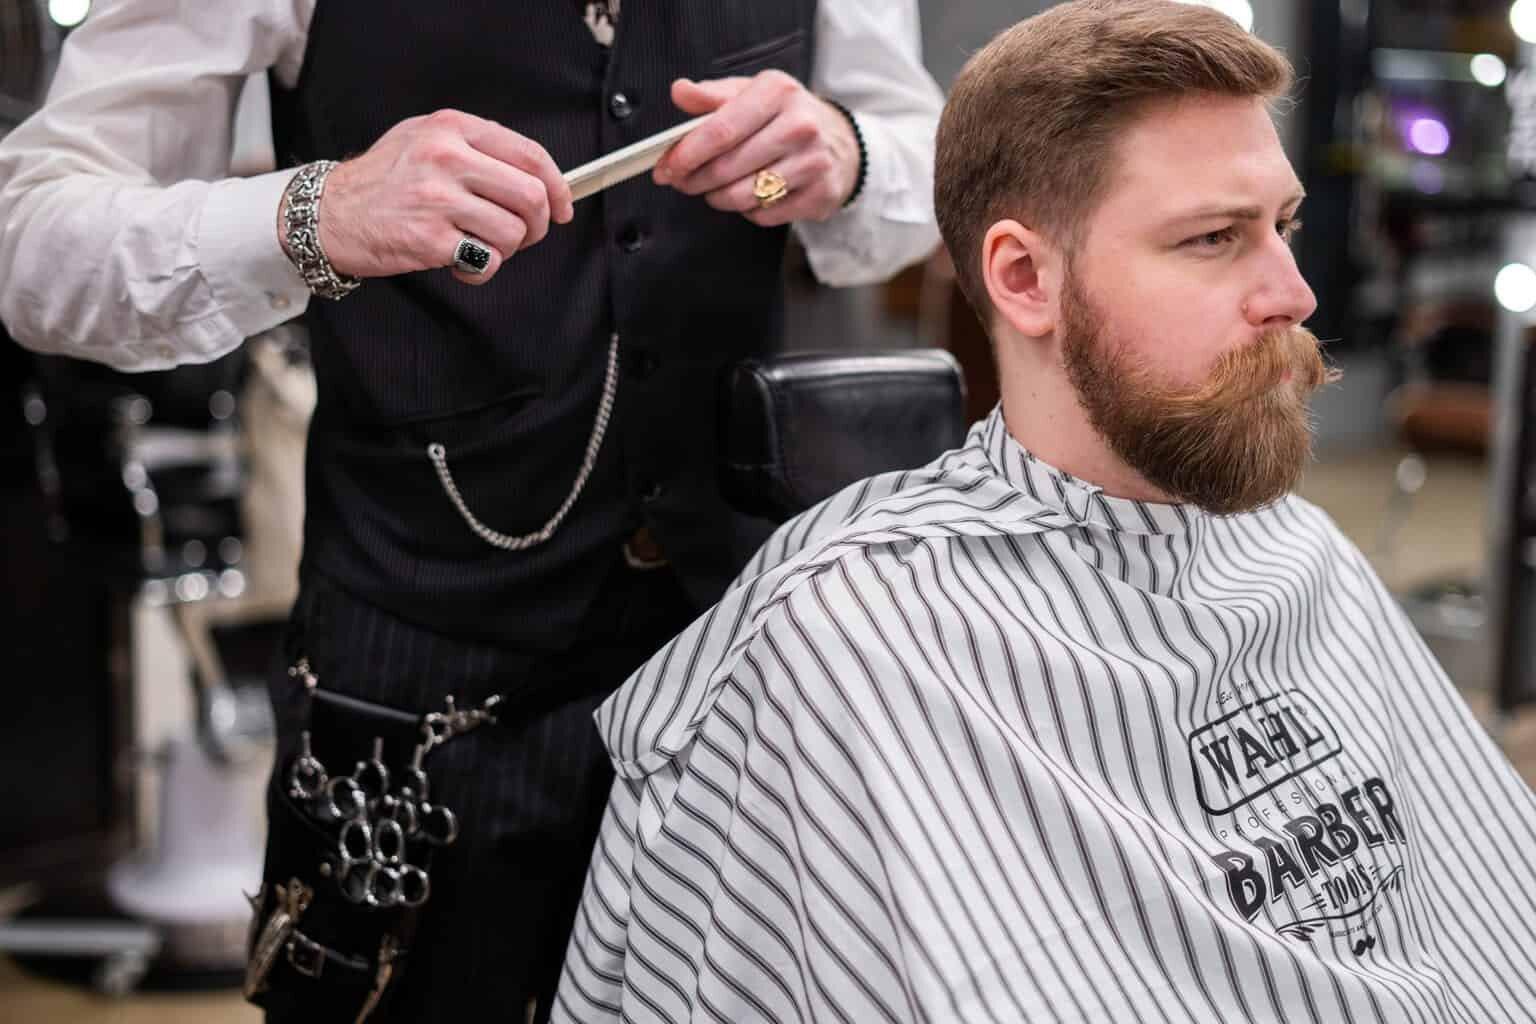 Beard Barber Shop